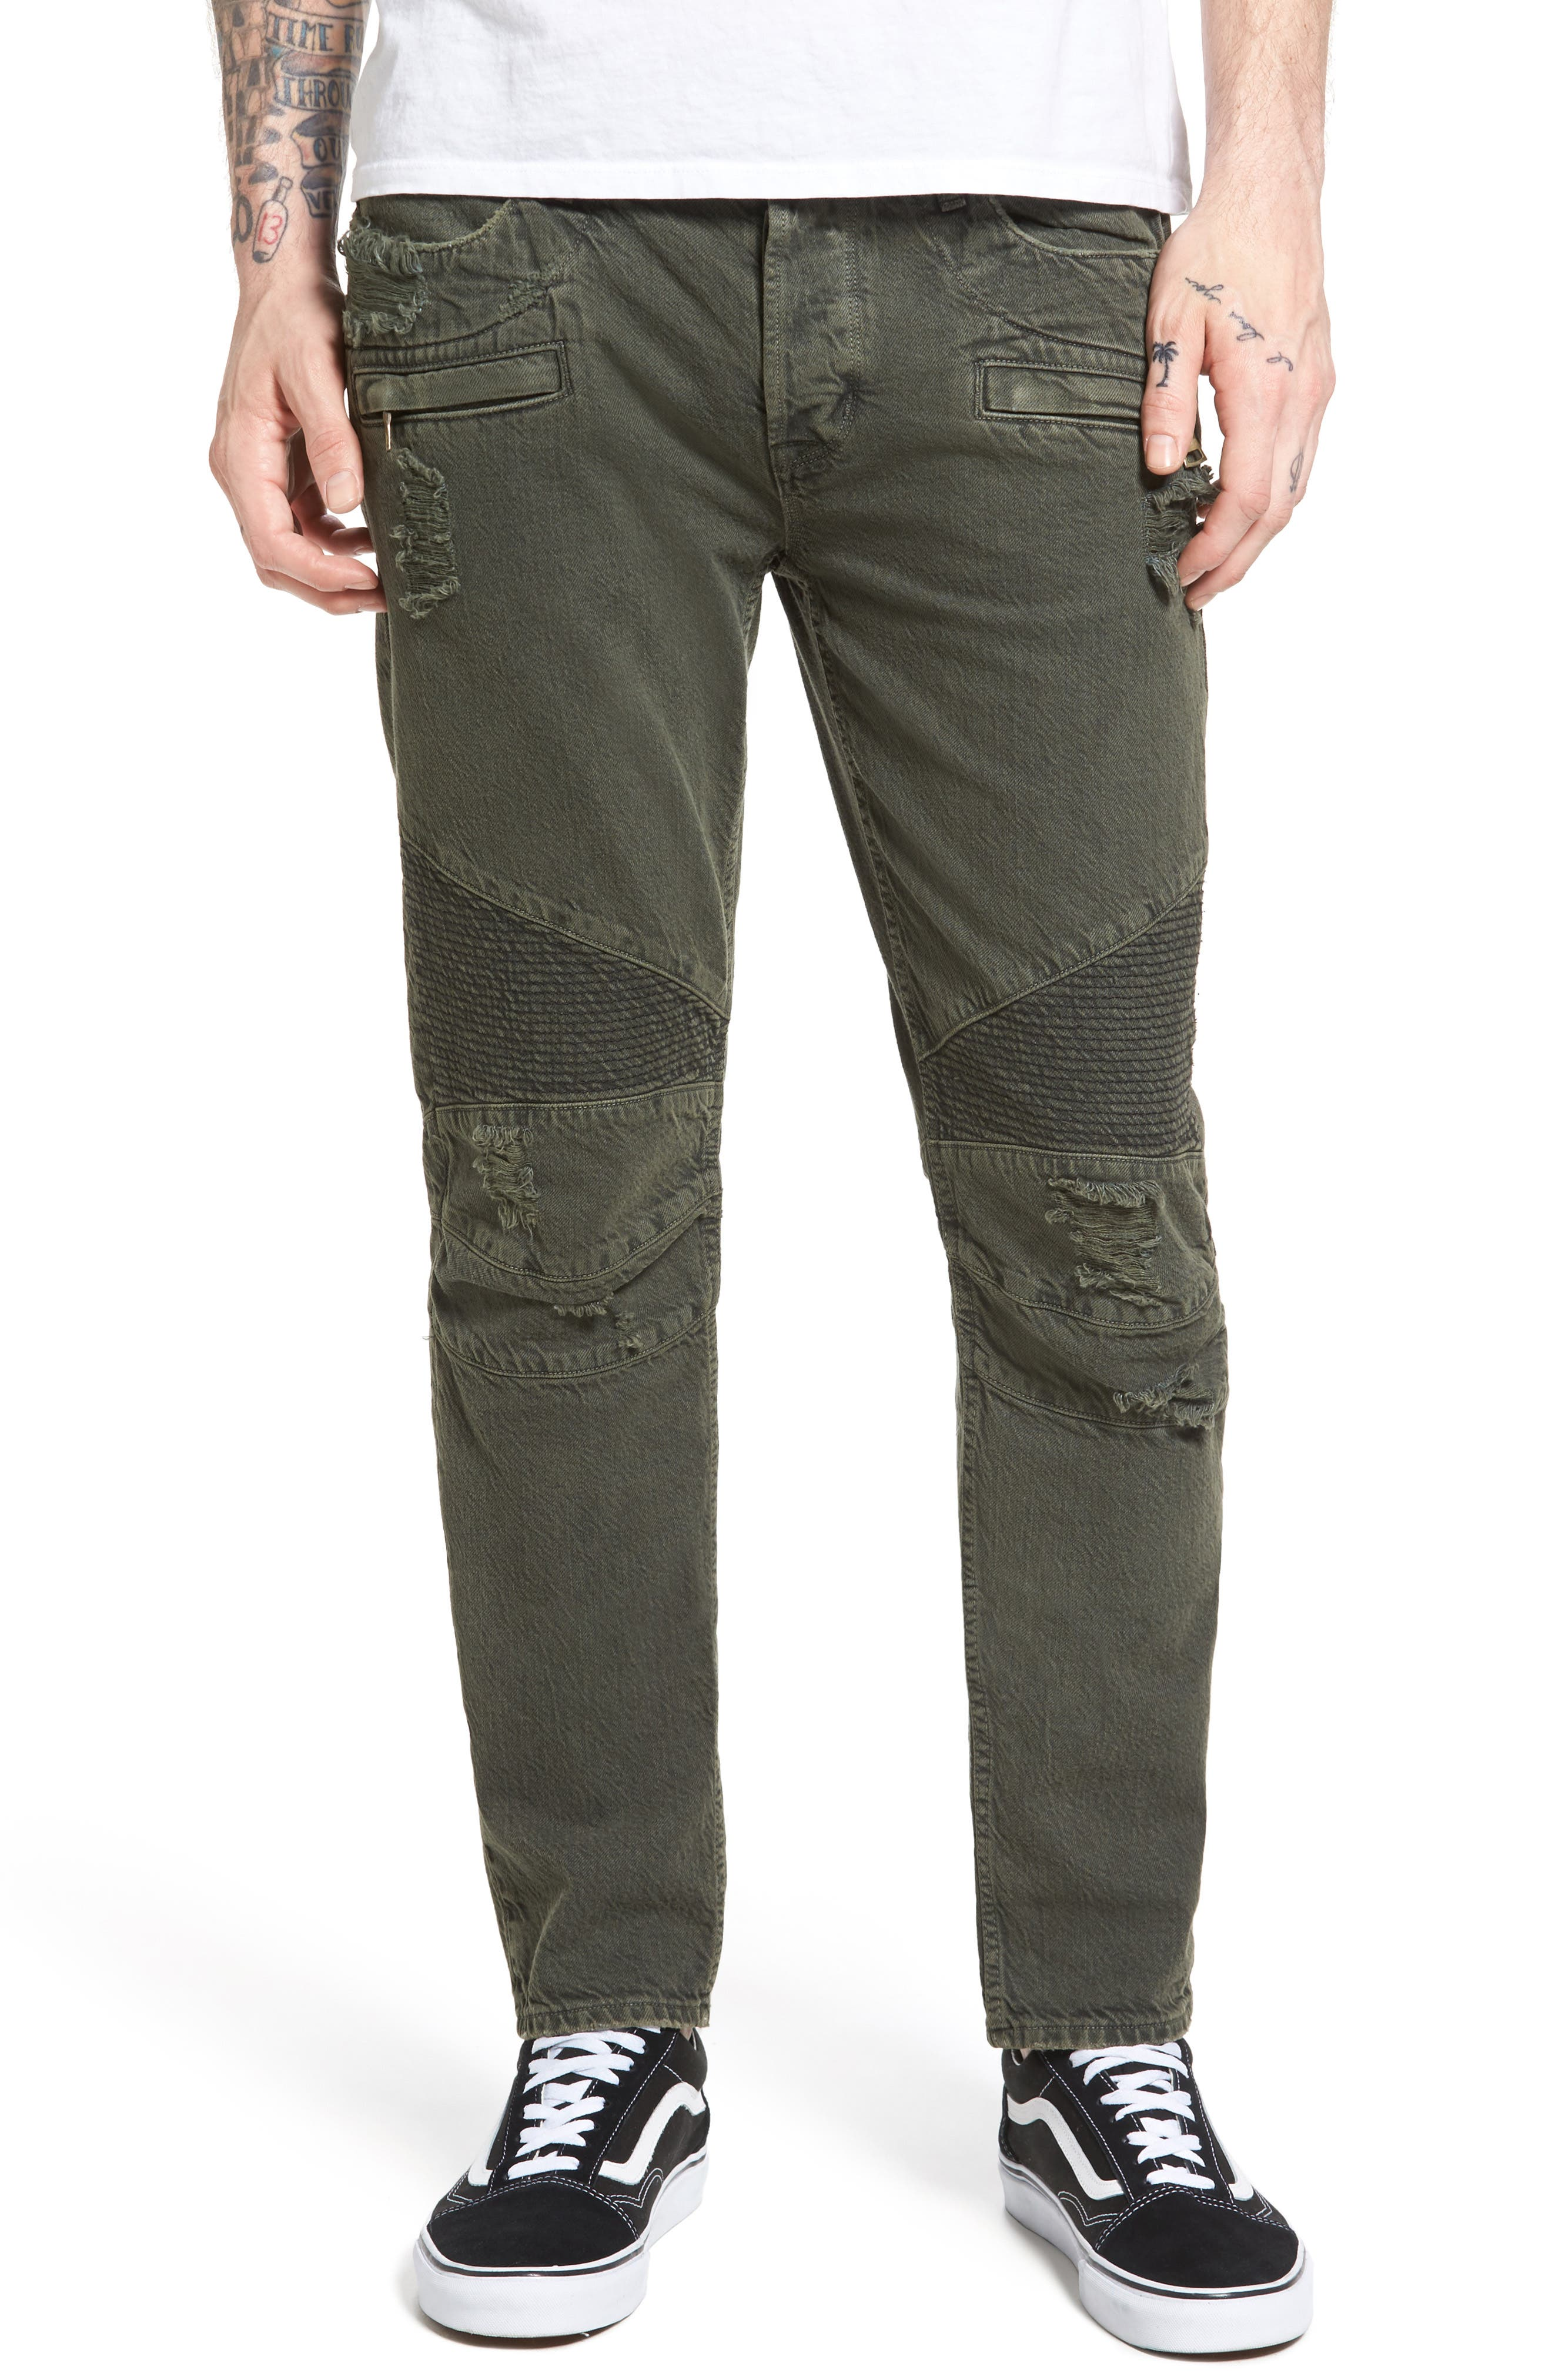 Blinder Biker Skinny Fit Jeans,                             Main thumbnail 1, color,                             300